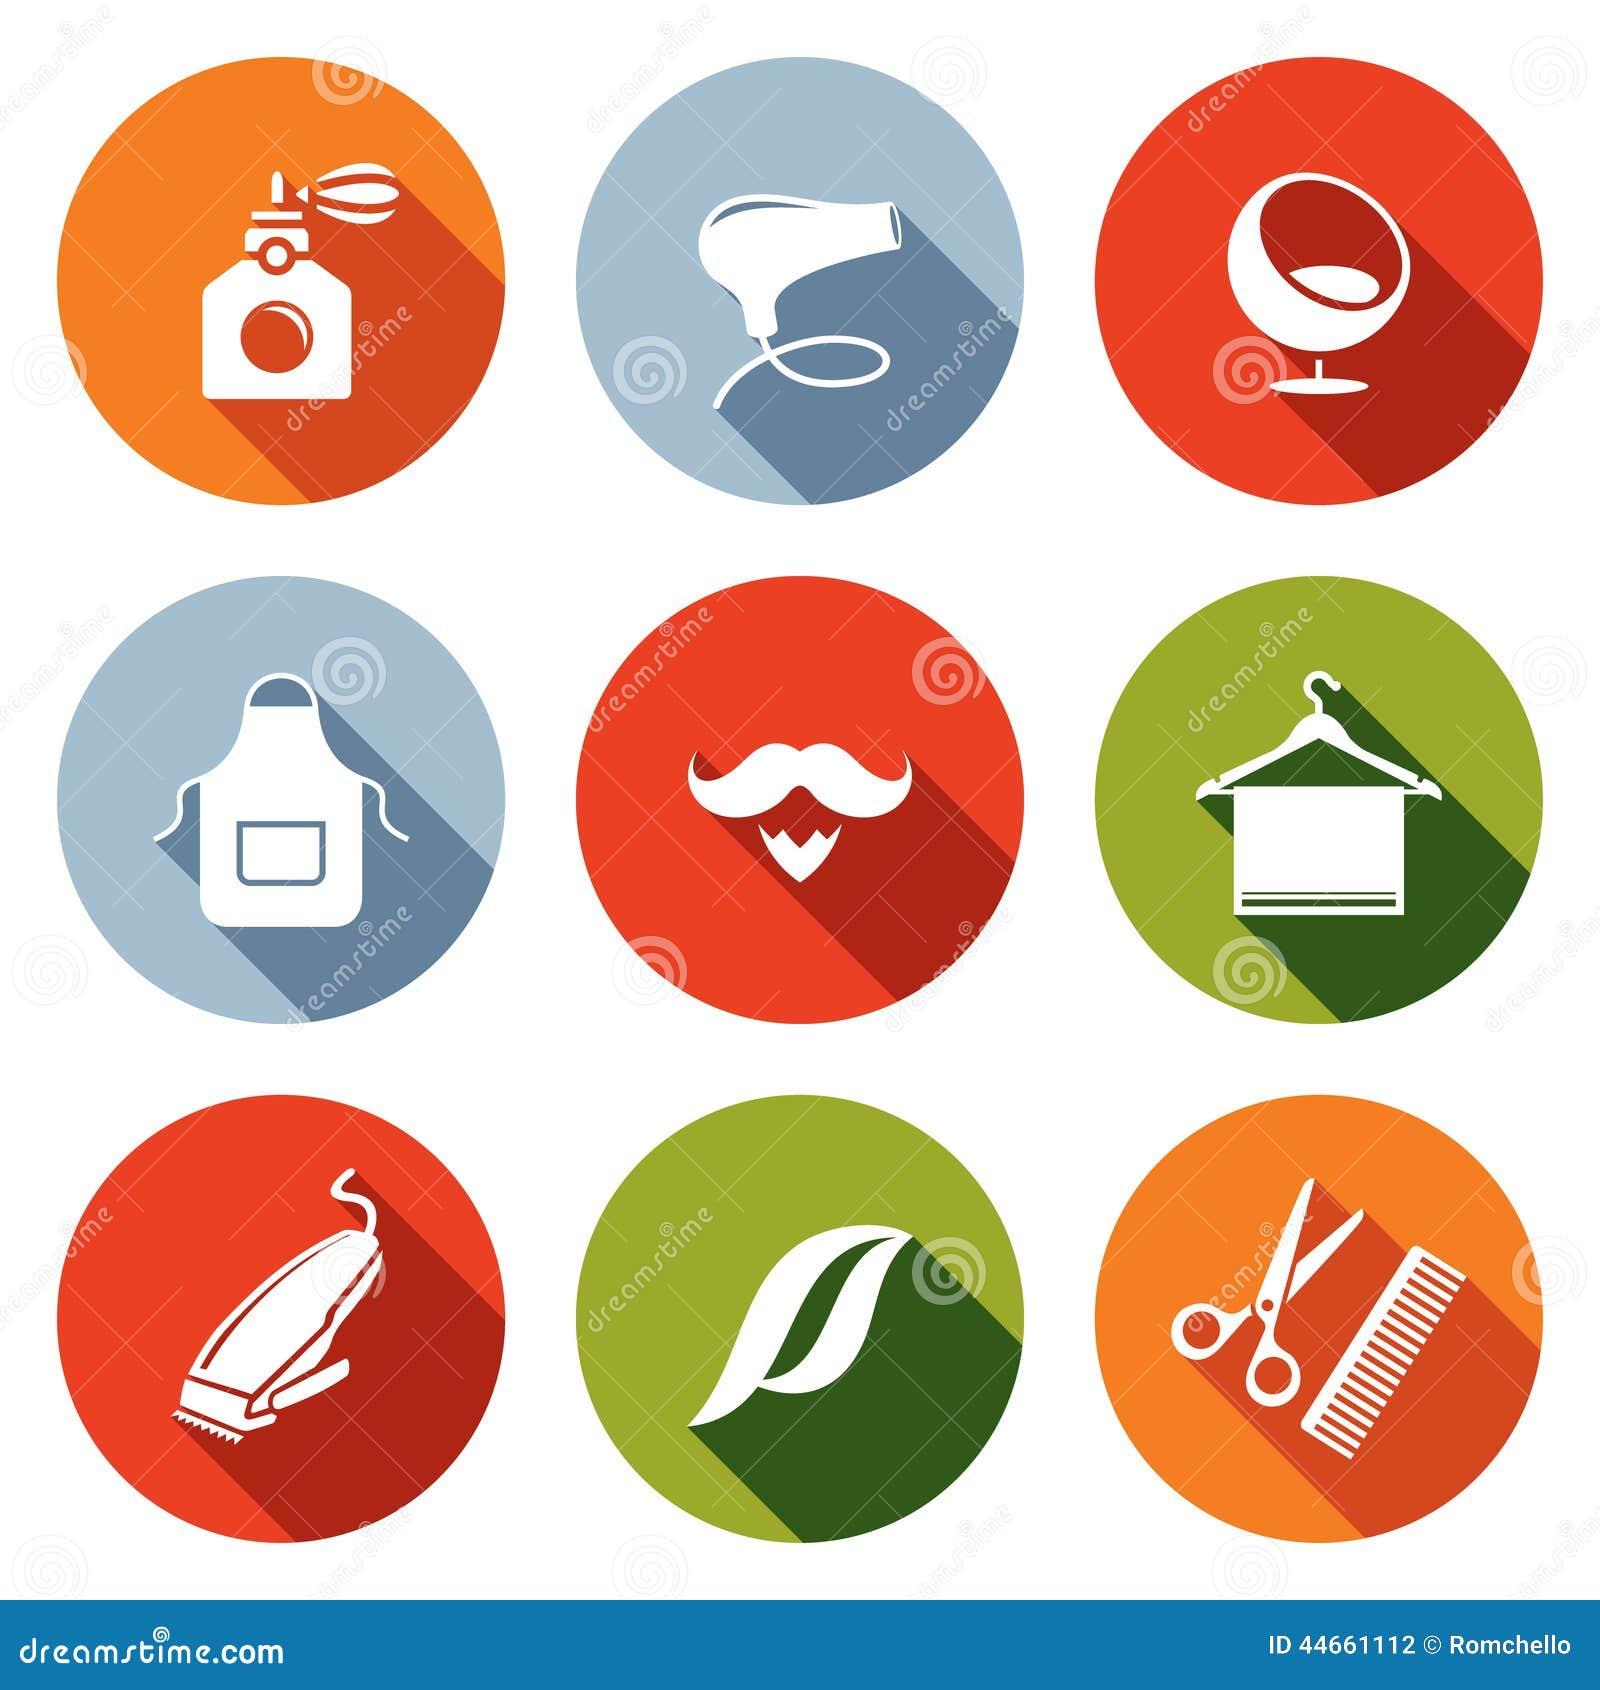 hair salon flat icon collection stock illustration image